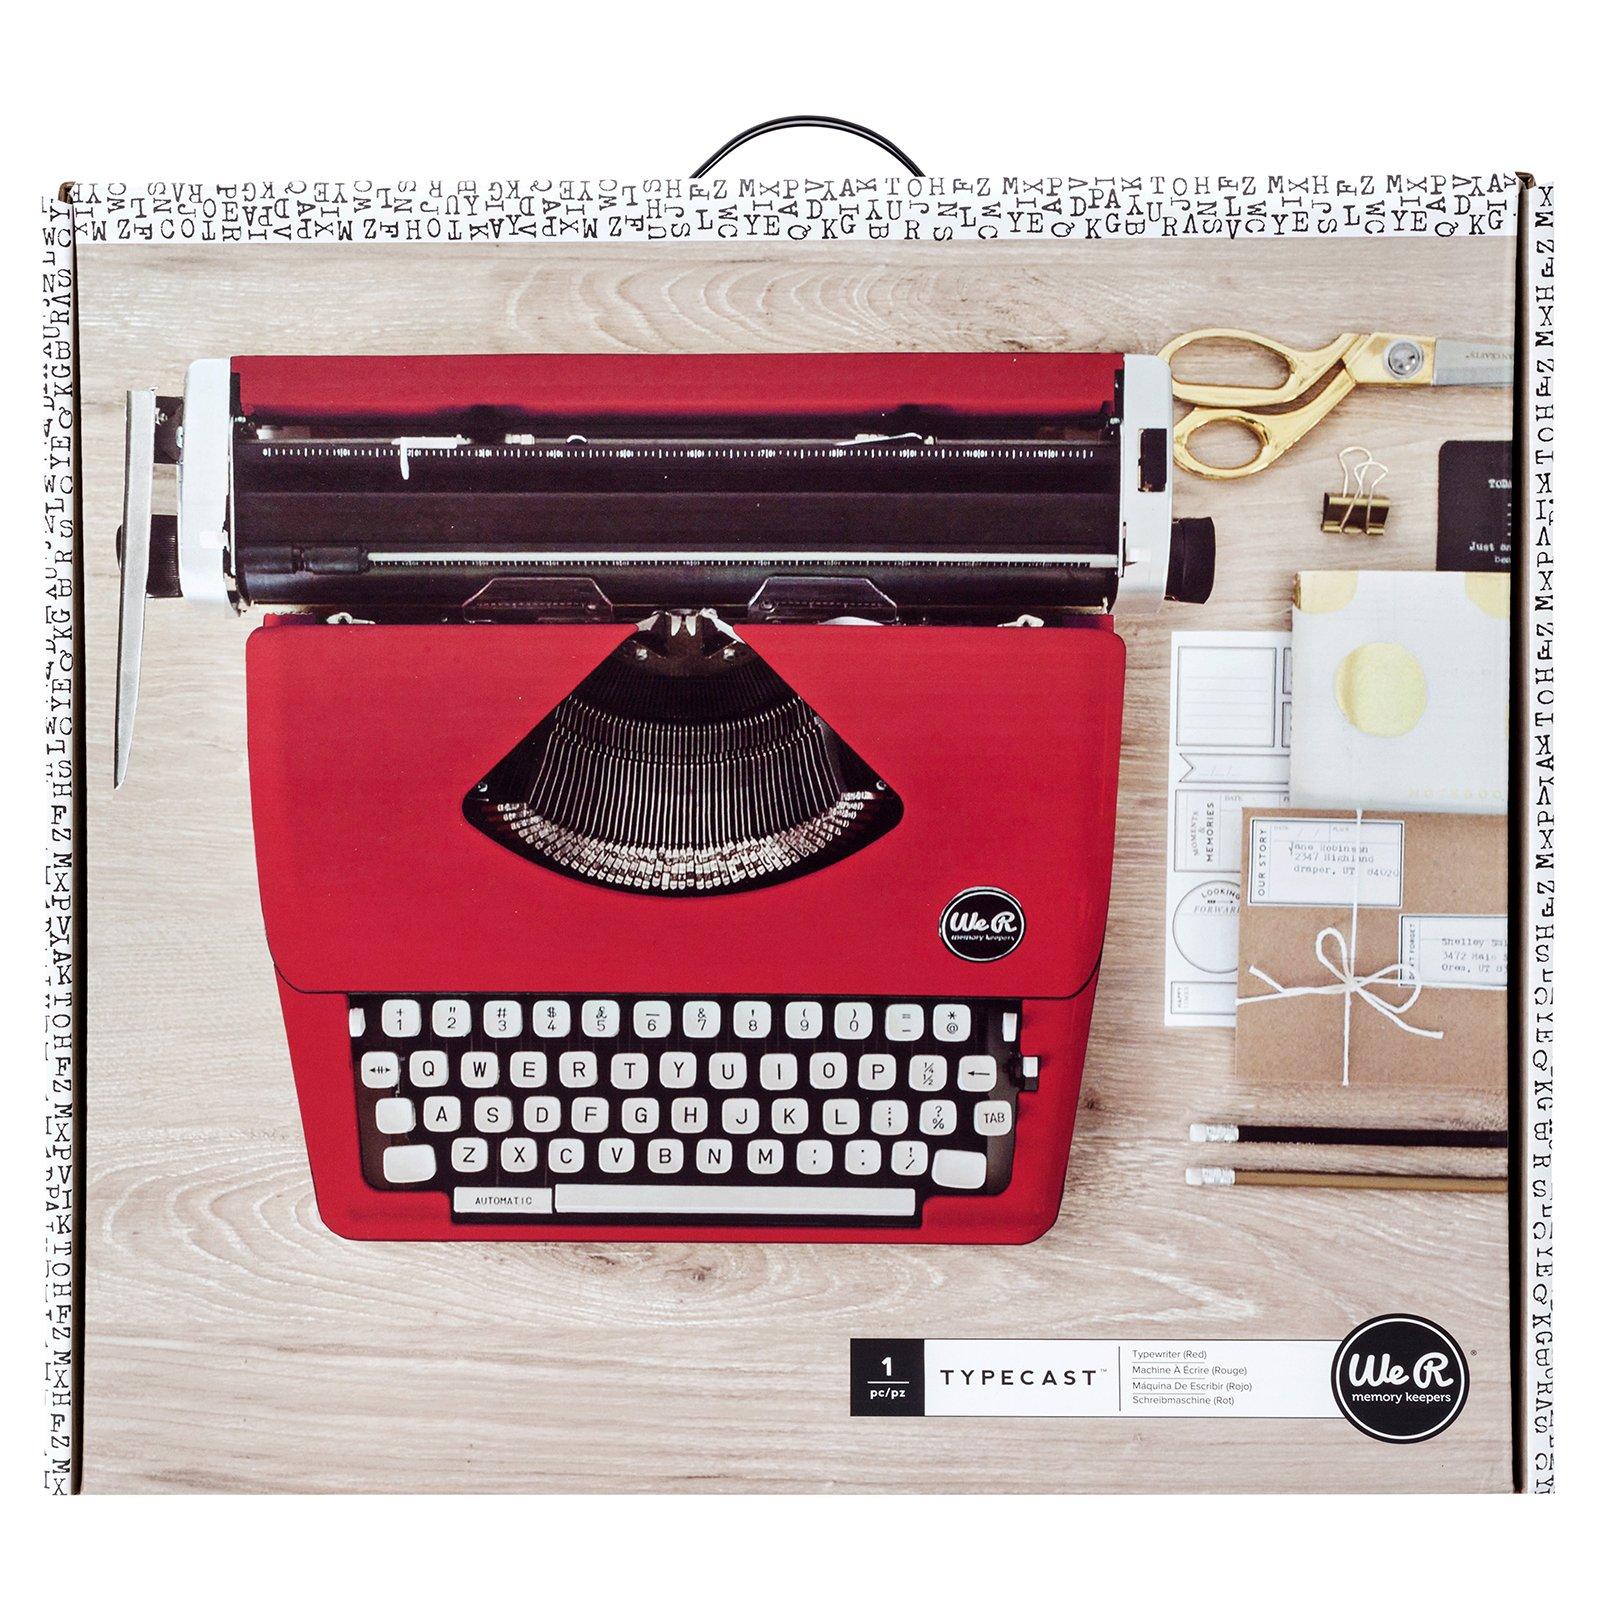 Typecast Retro Typewriter by We R Memory Keepers   Red by We R Memory Keepers